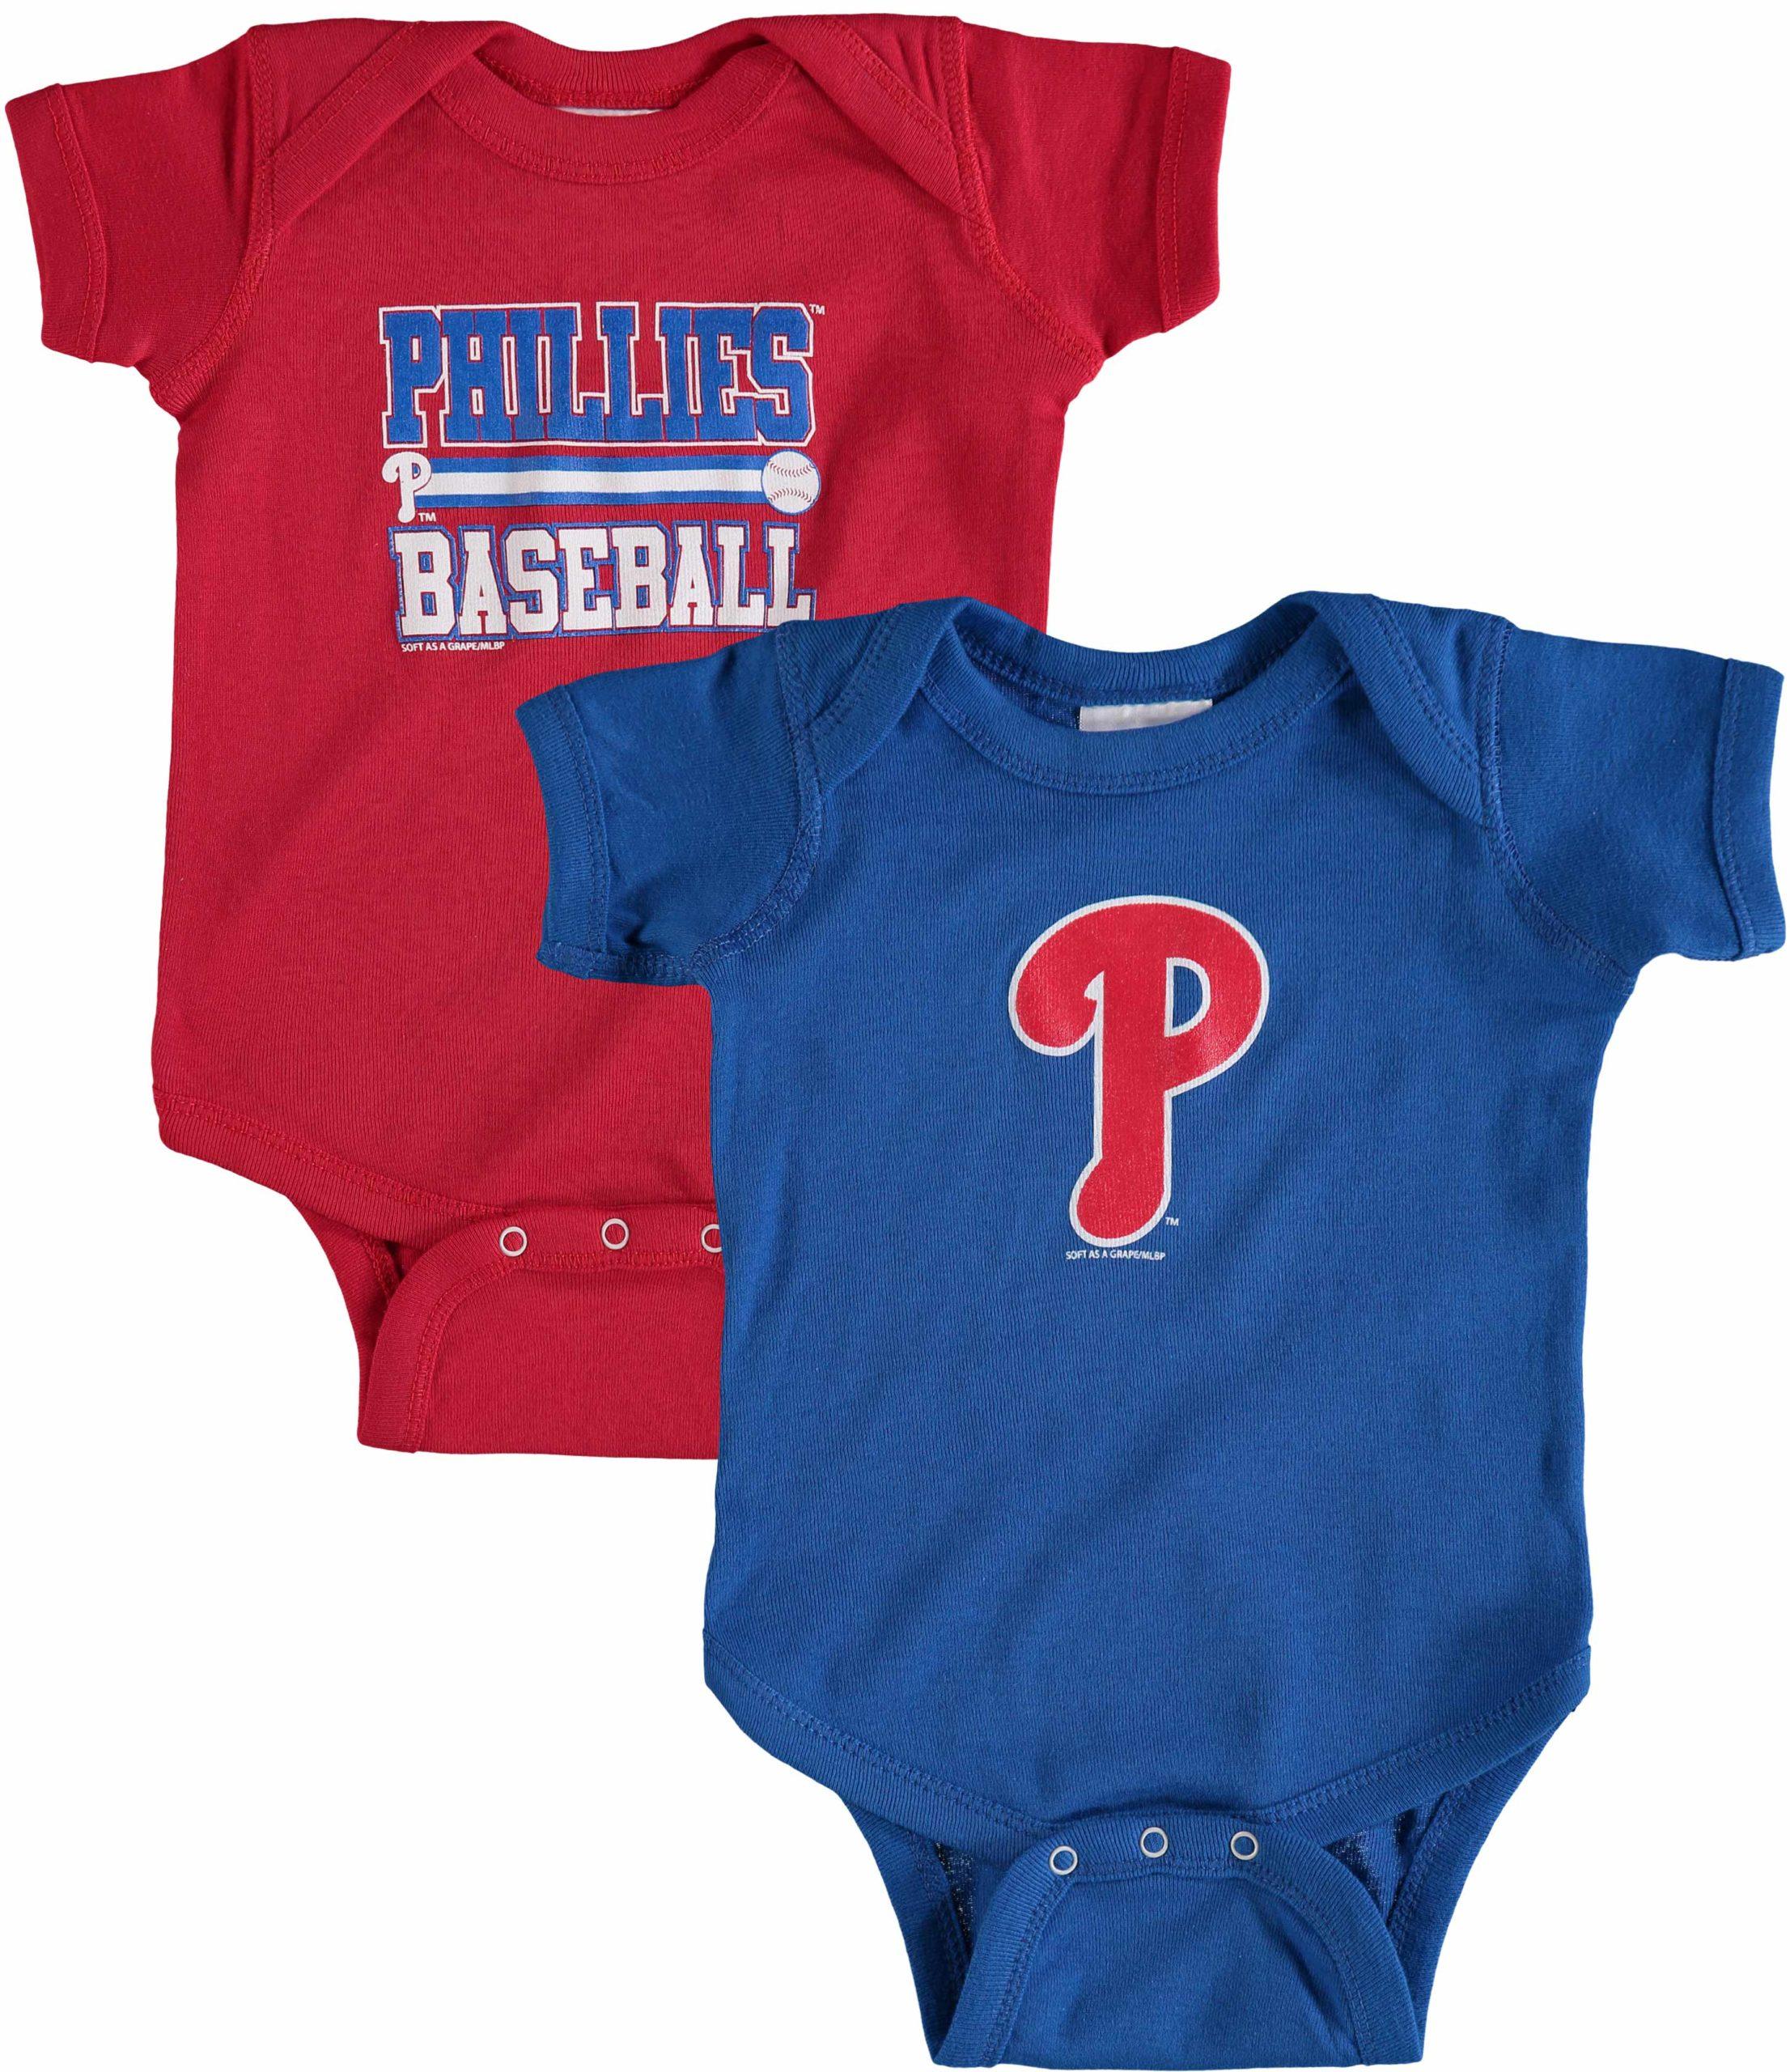 Philadelphia Phillies Soft as a Grape Newborn & Infant 2-Piece Body Suit - Red/Royal